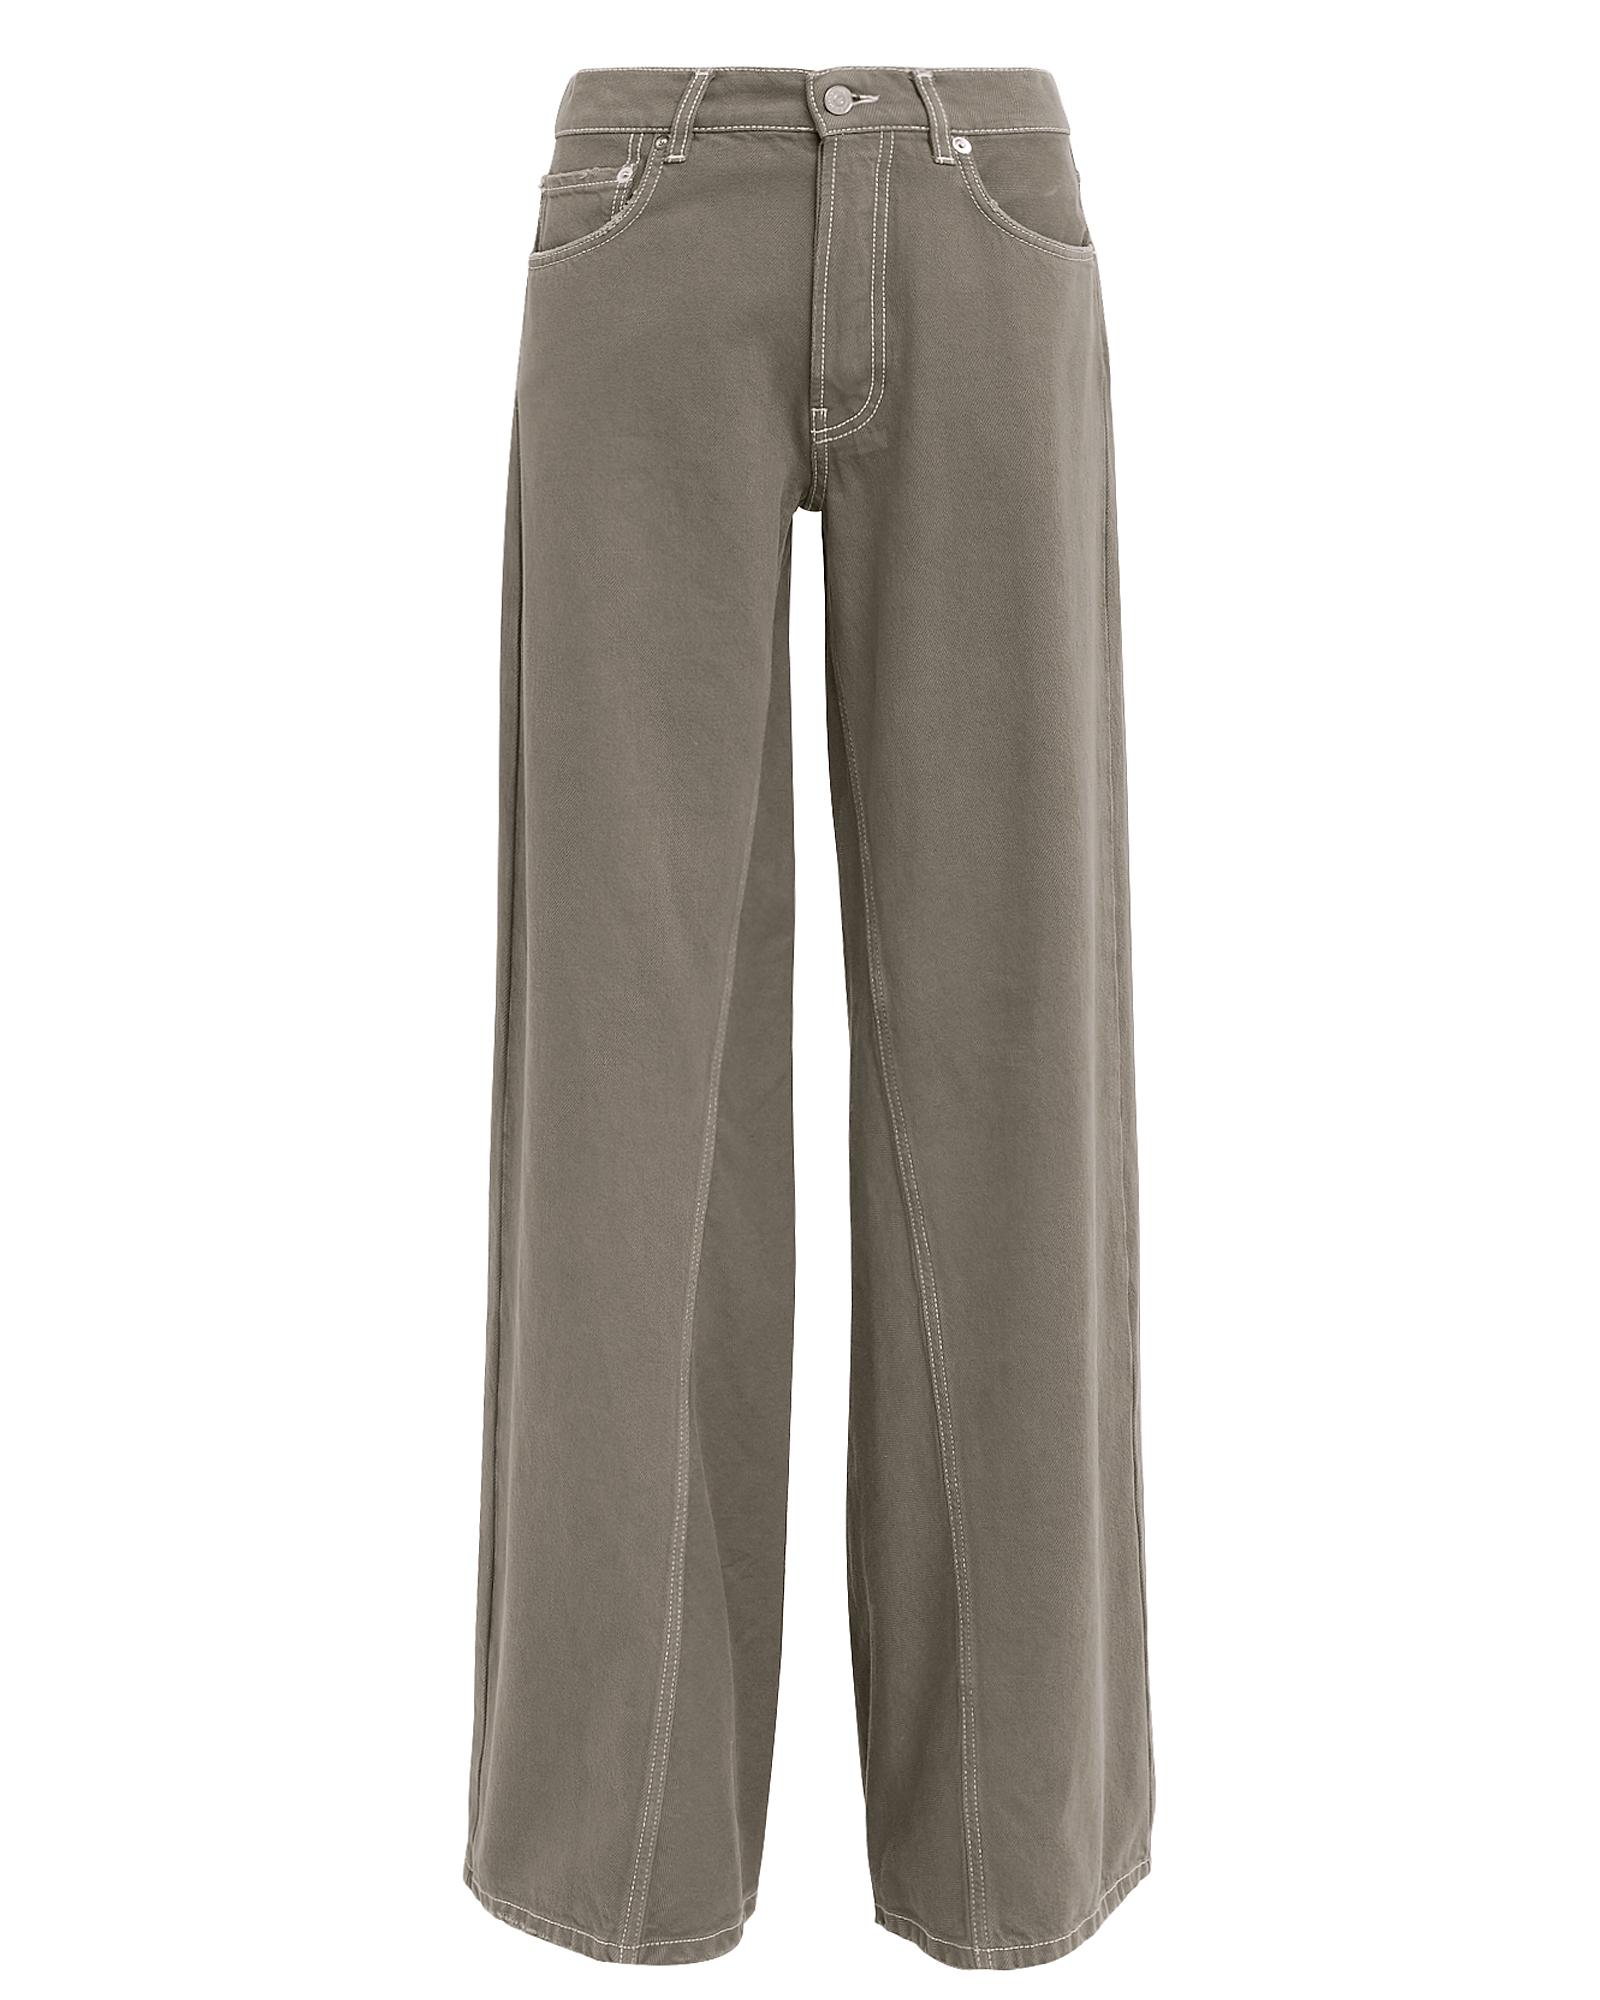 Ganni Jeans GANNI SHILOH WIDE LEG JEANS  OLIVE 26